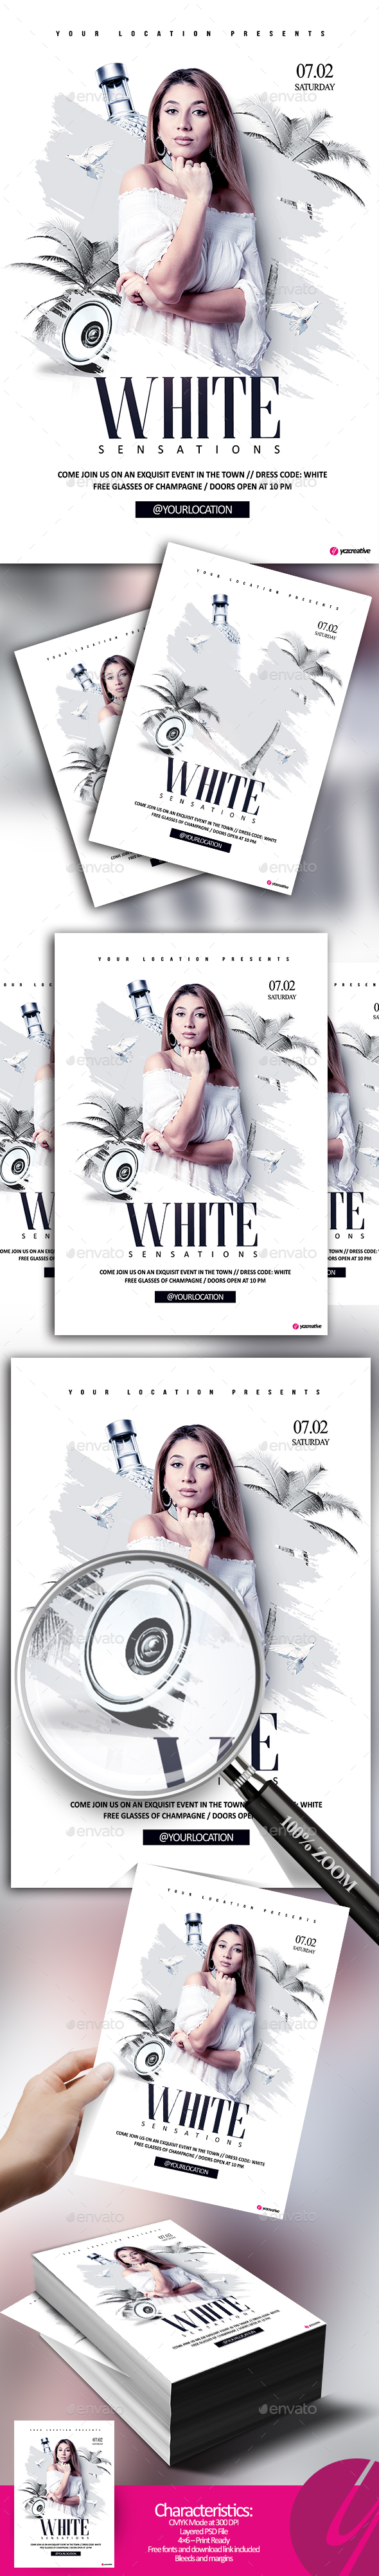 White Sensations - Clubs & Parties Events